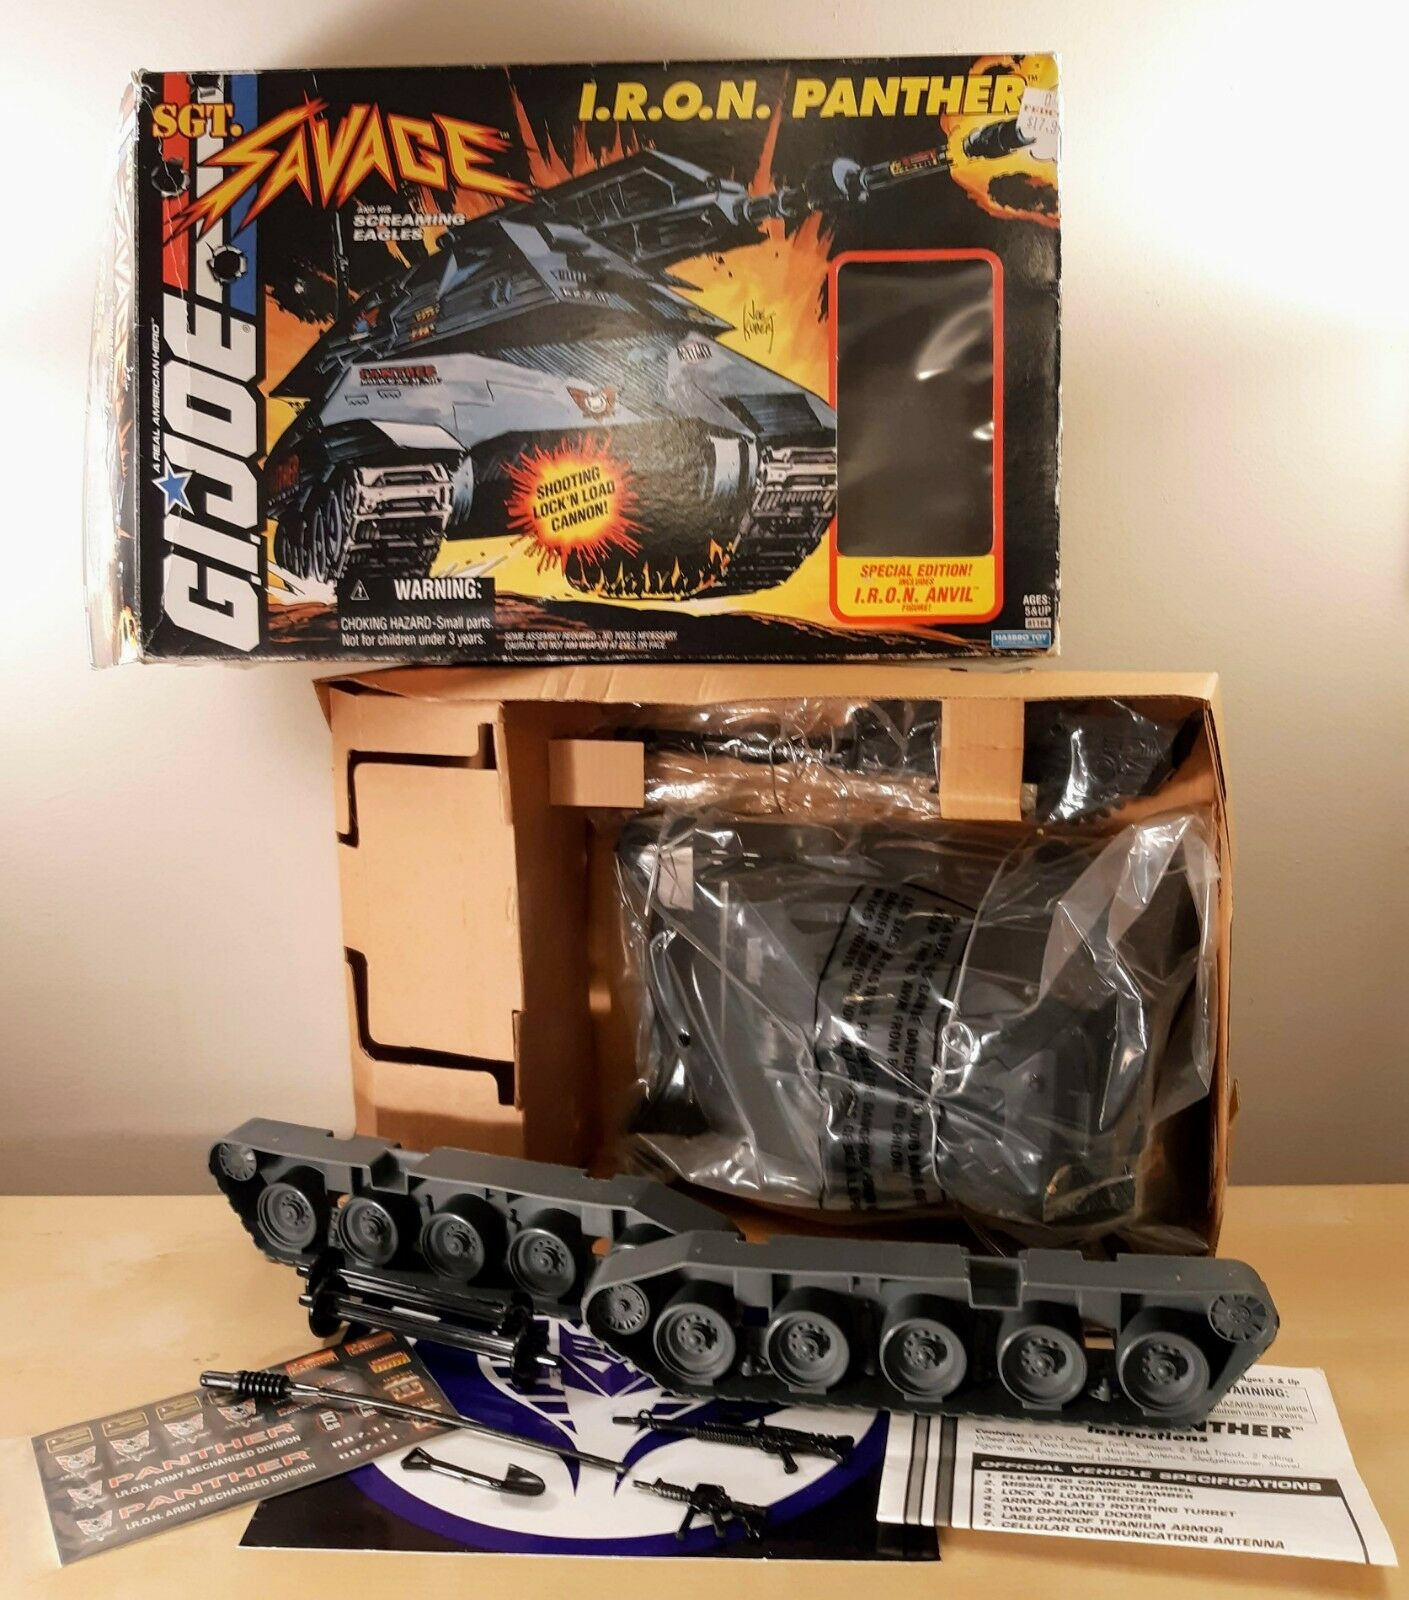 Gi Joe Sgt Savage Hierro Panther G. I. Joe 1995 Vintage Pristina Raro